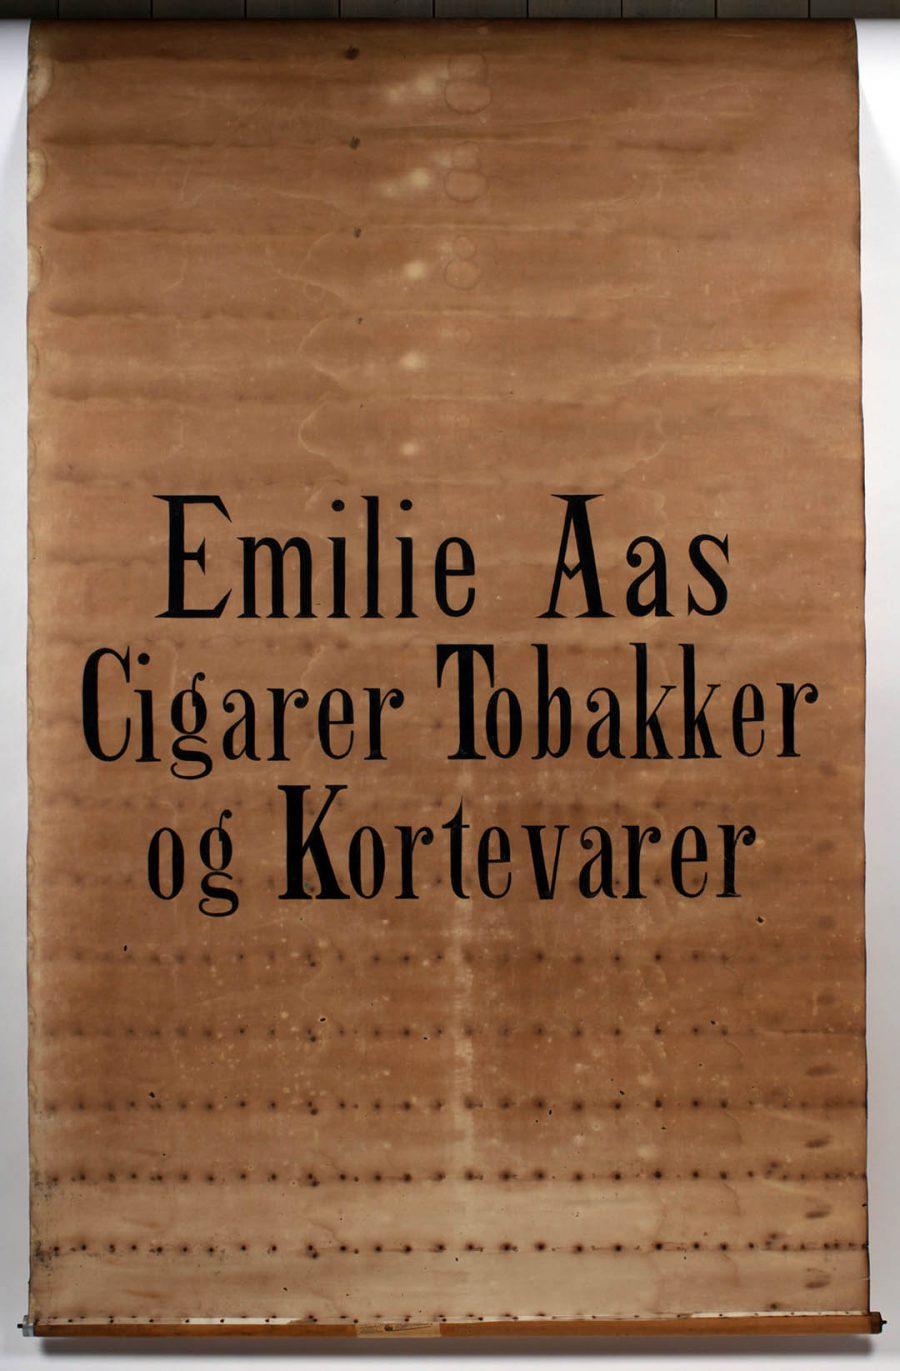 RULLEGARDIN EMILIE AAS CIGARER TOBAKKER OG KORTEVARER